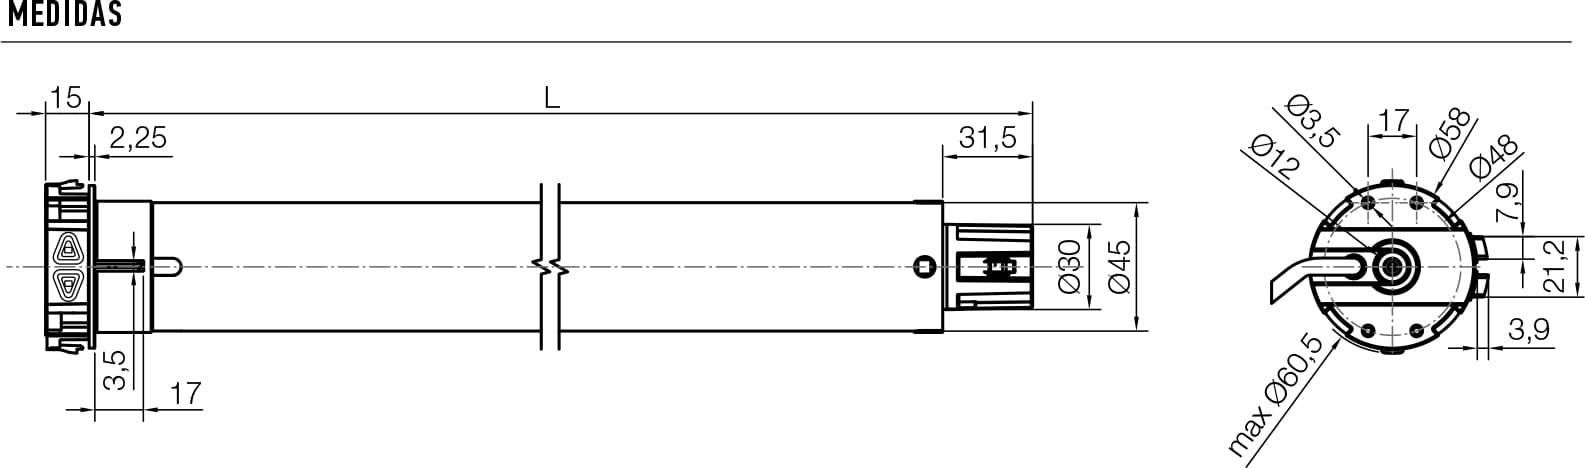 caracteristicas-quick-m-2